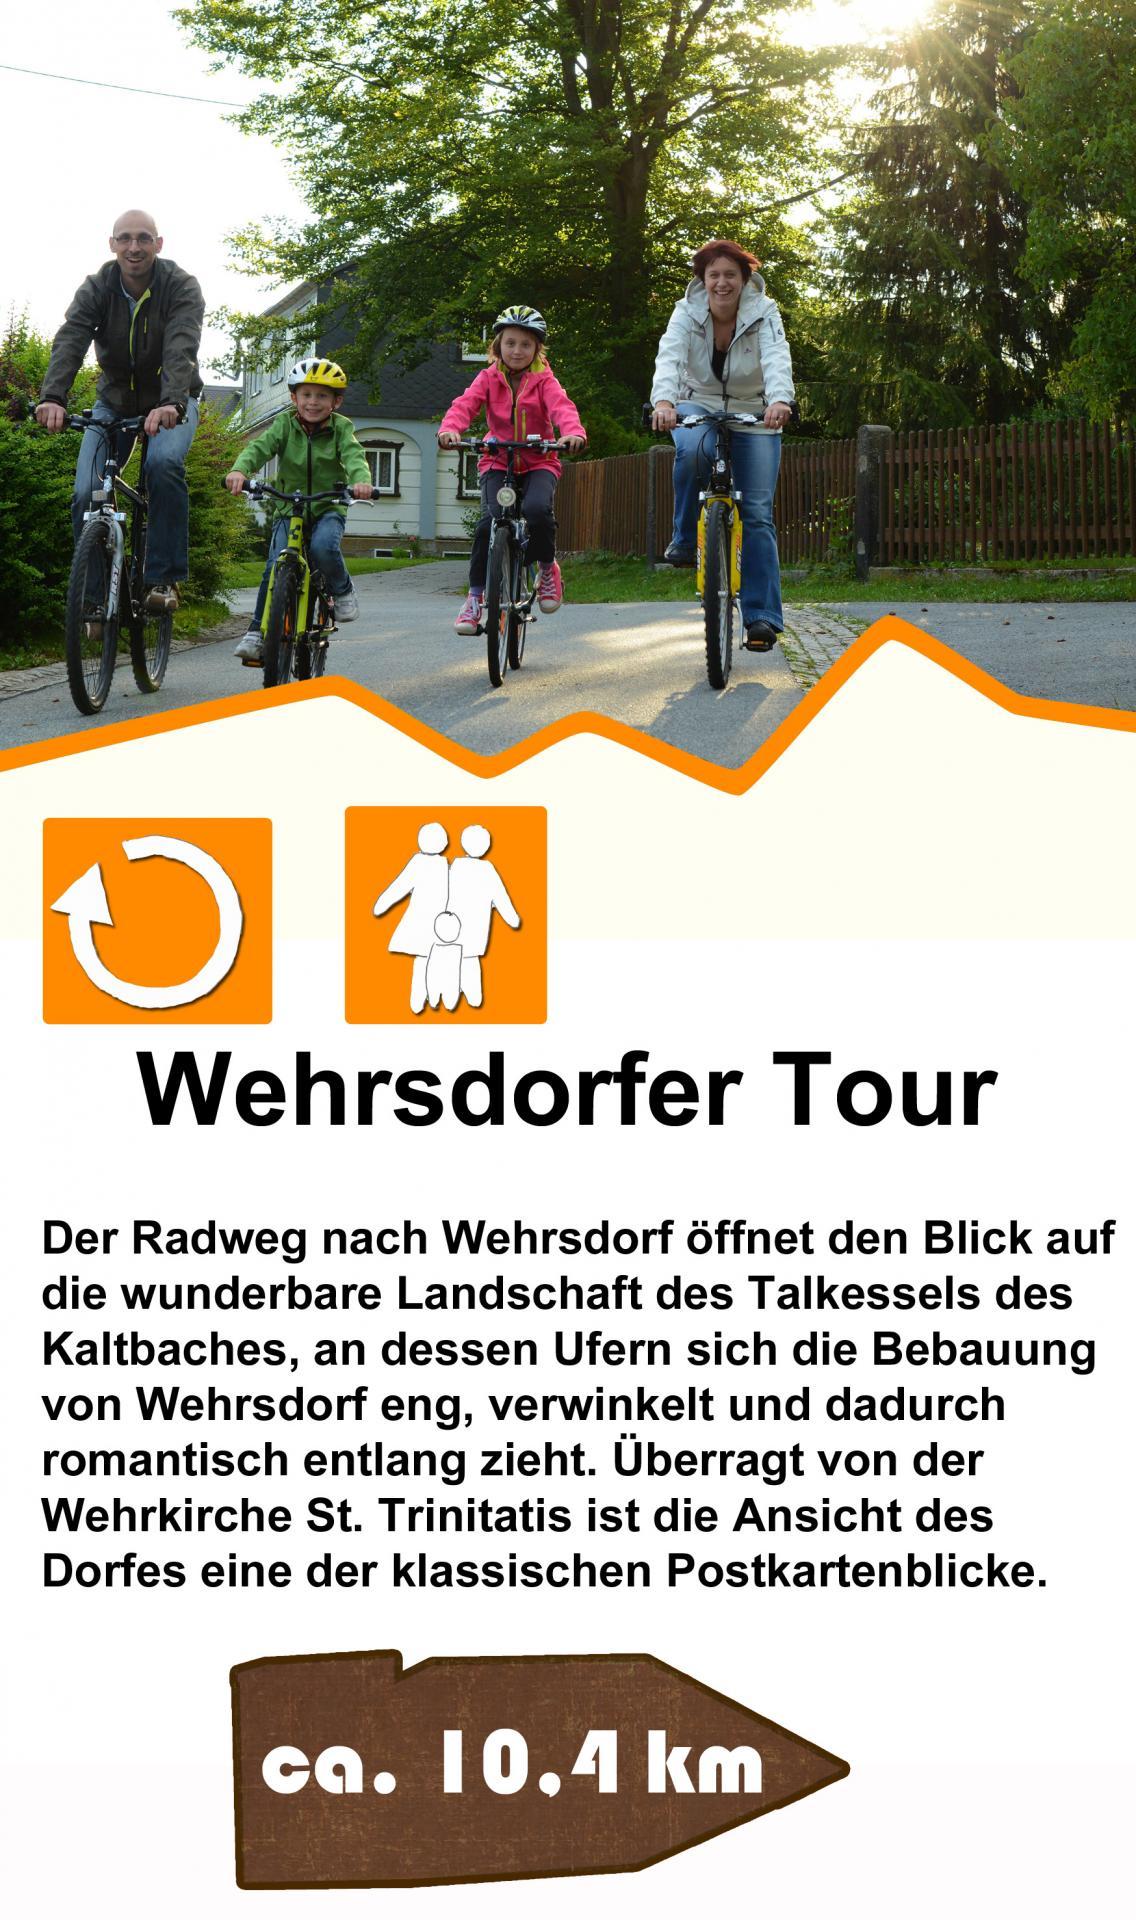 Wehrsdorfer Tour